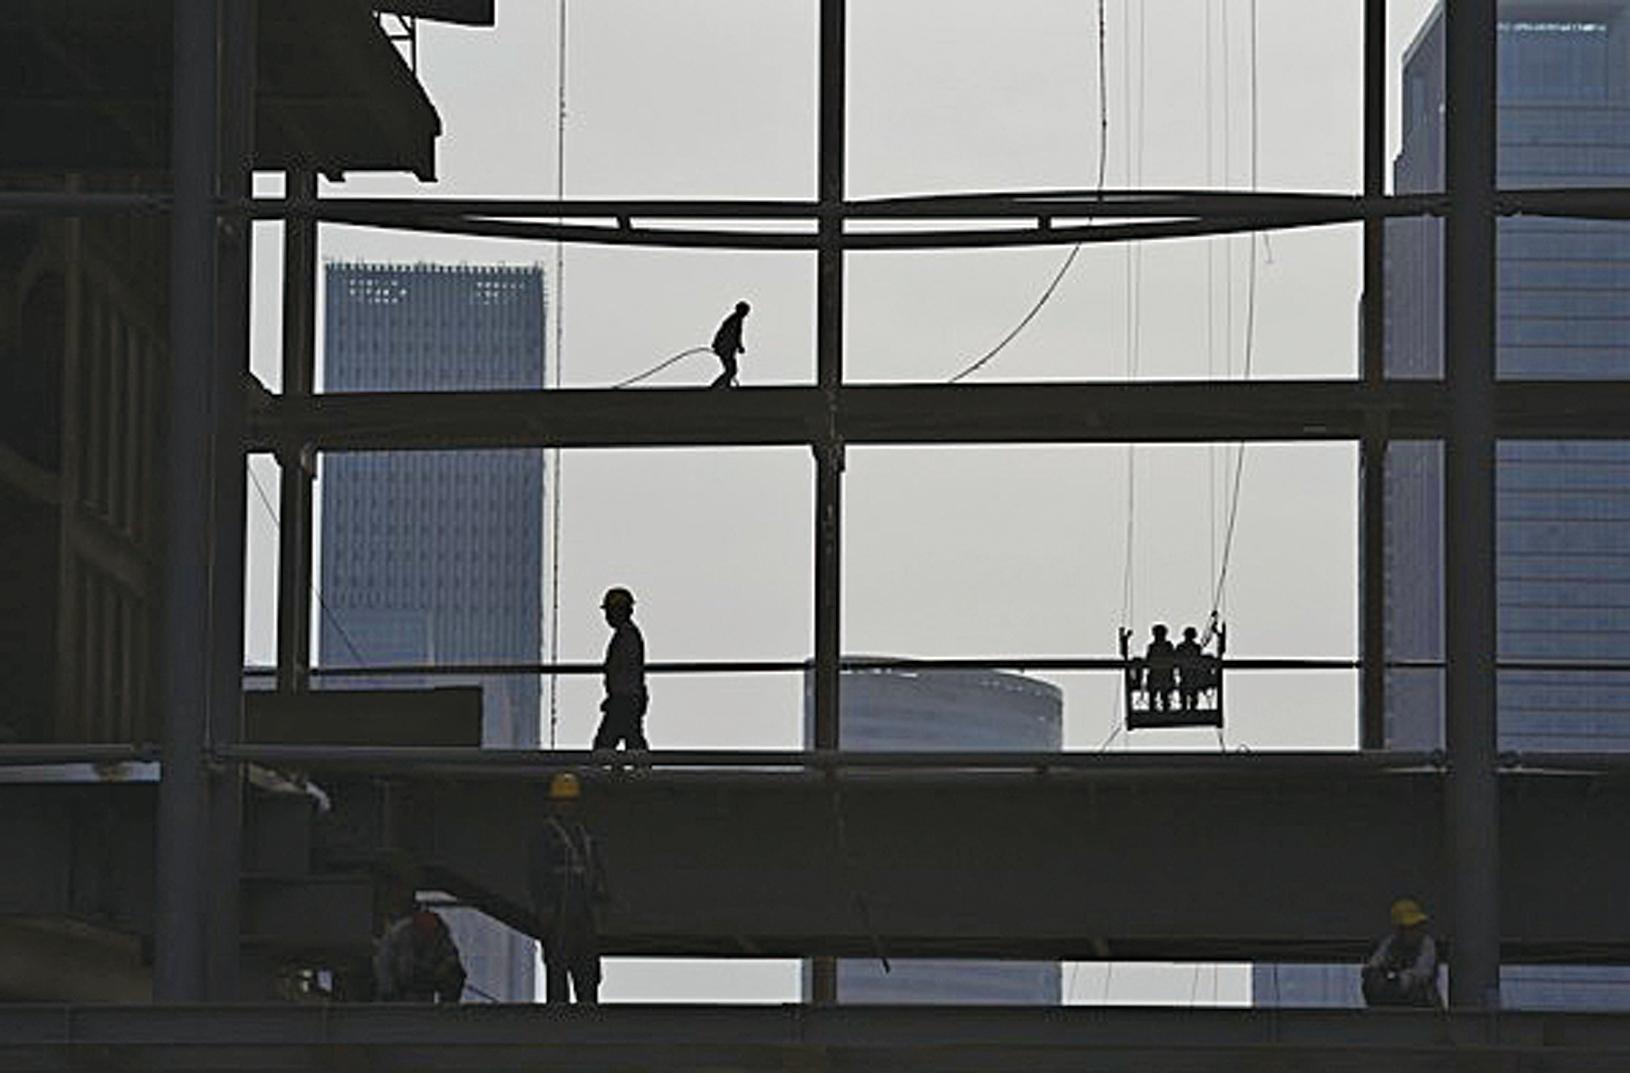 中國經濟出現風險。(Getty Images)